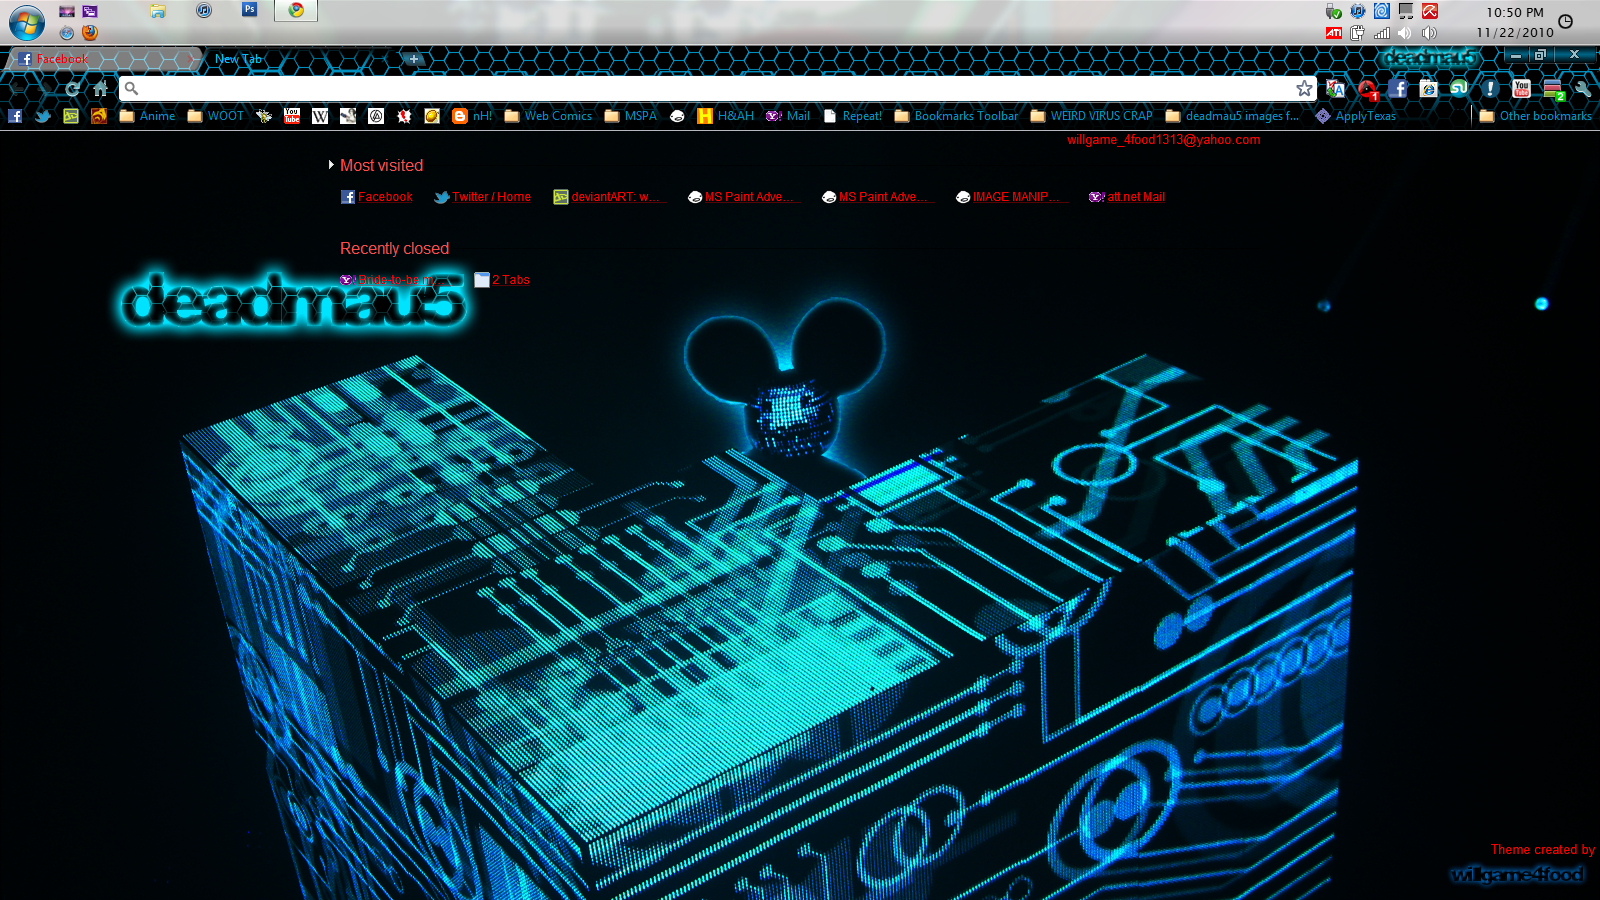 Deadmau5 Chrome Theme 1600 by willgame4food on DeviantArt